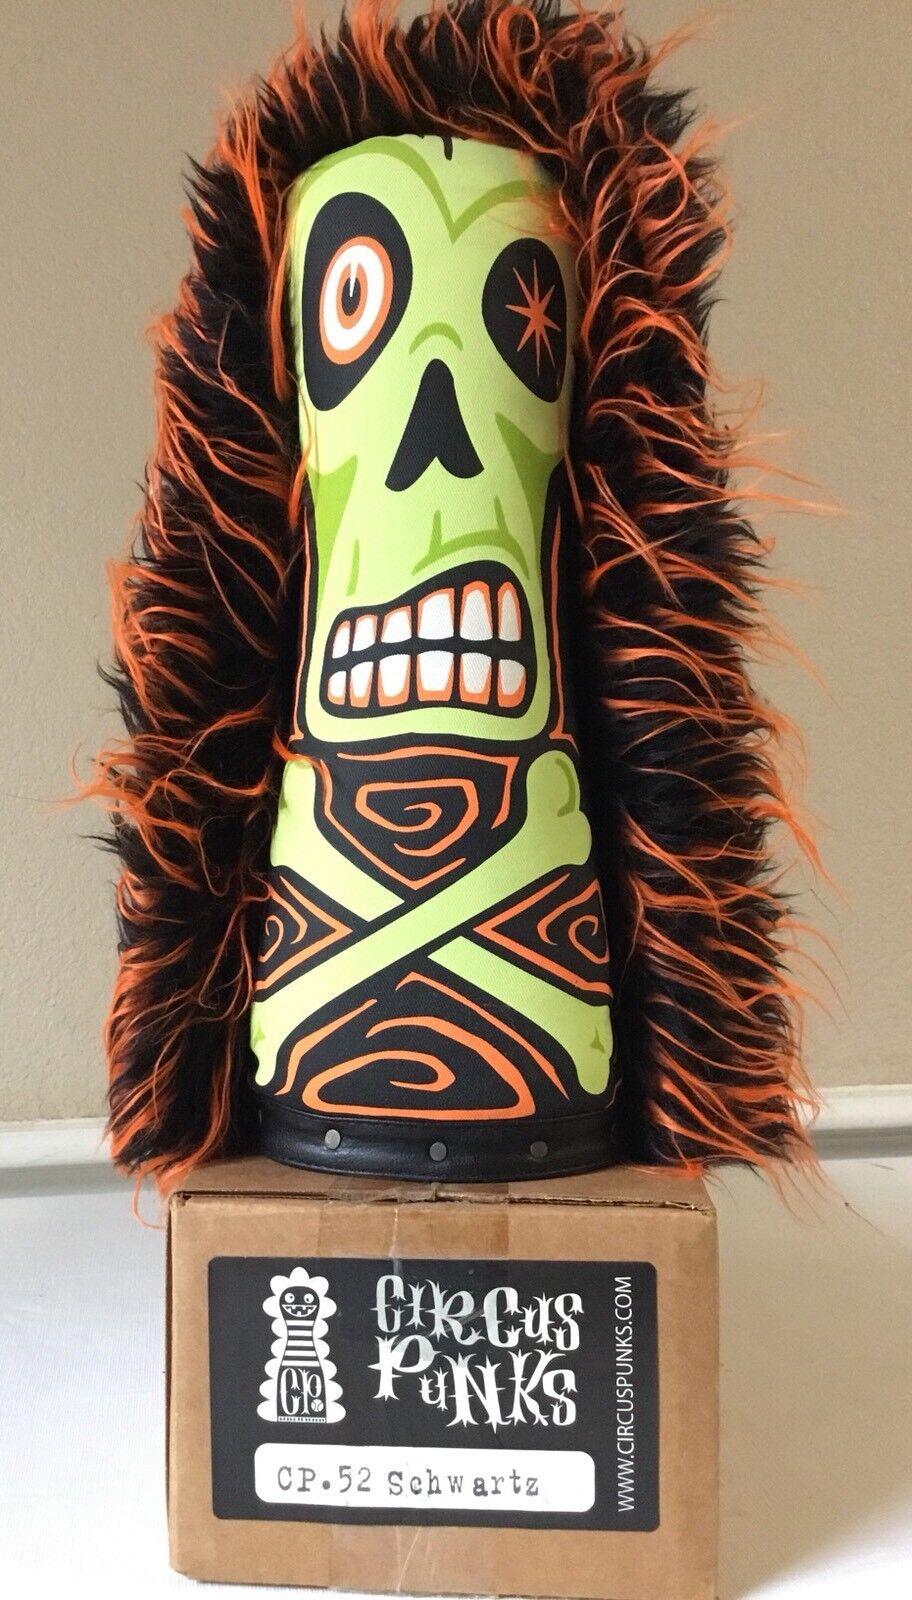 2005 Rob Schwarts Circus Punk Skull N Bones Limited Edition Signed 27 125